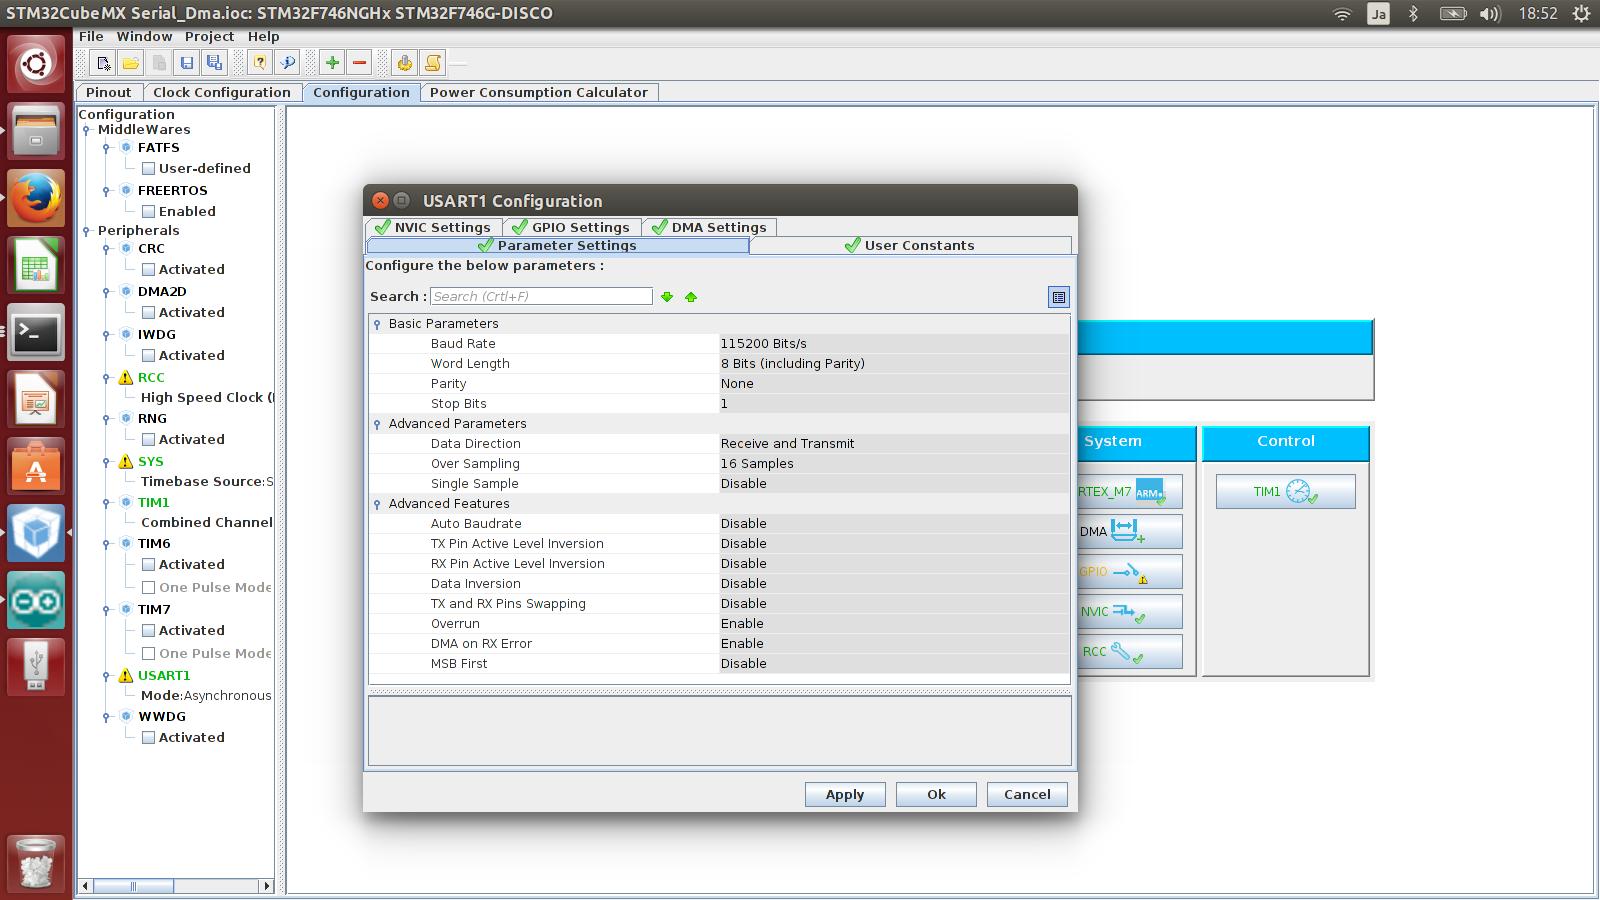 Stm32cubemx Encoder (Using Timer) | Share knowledge